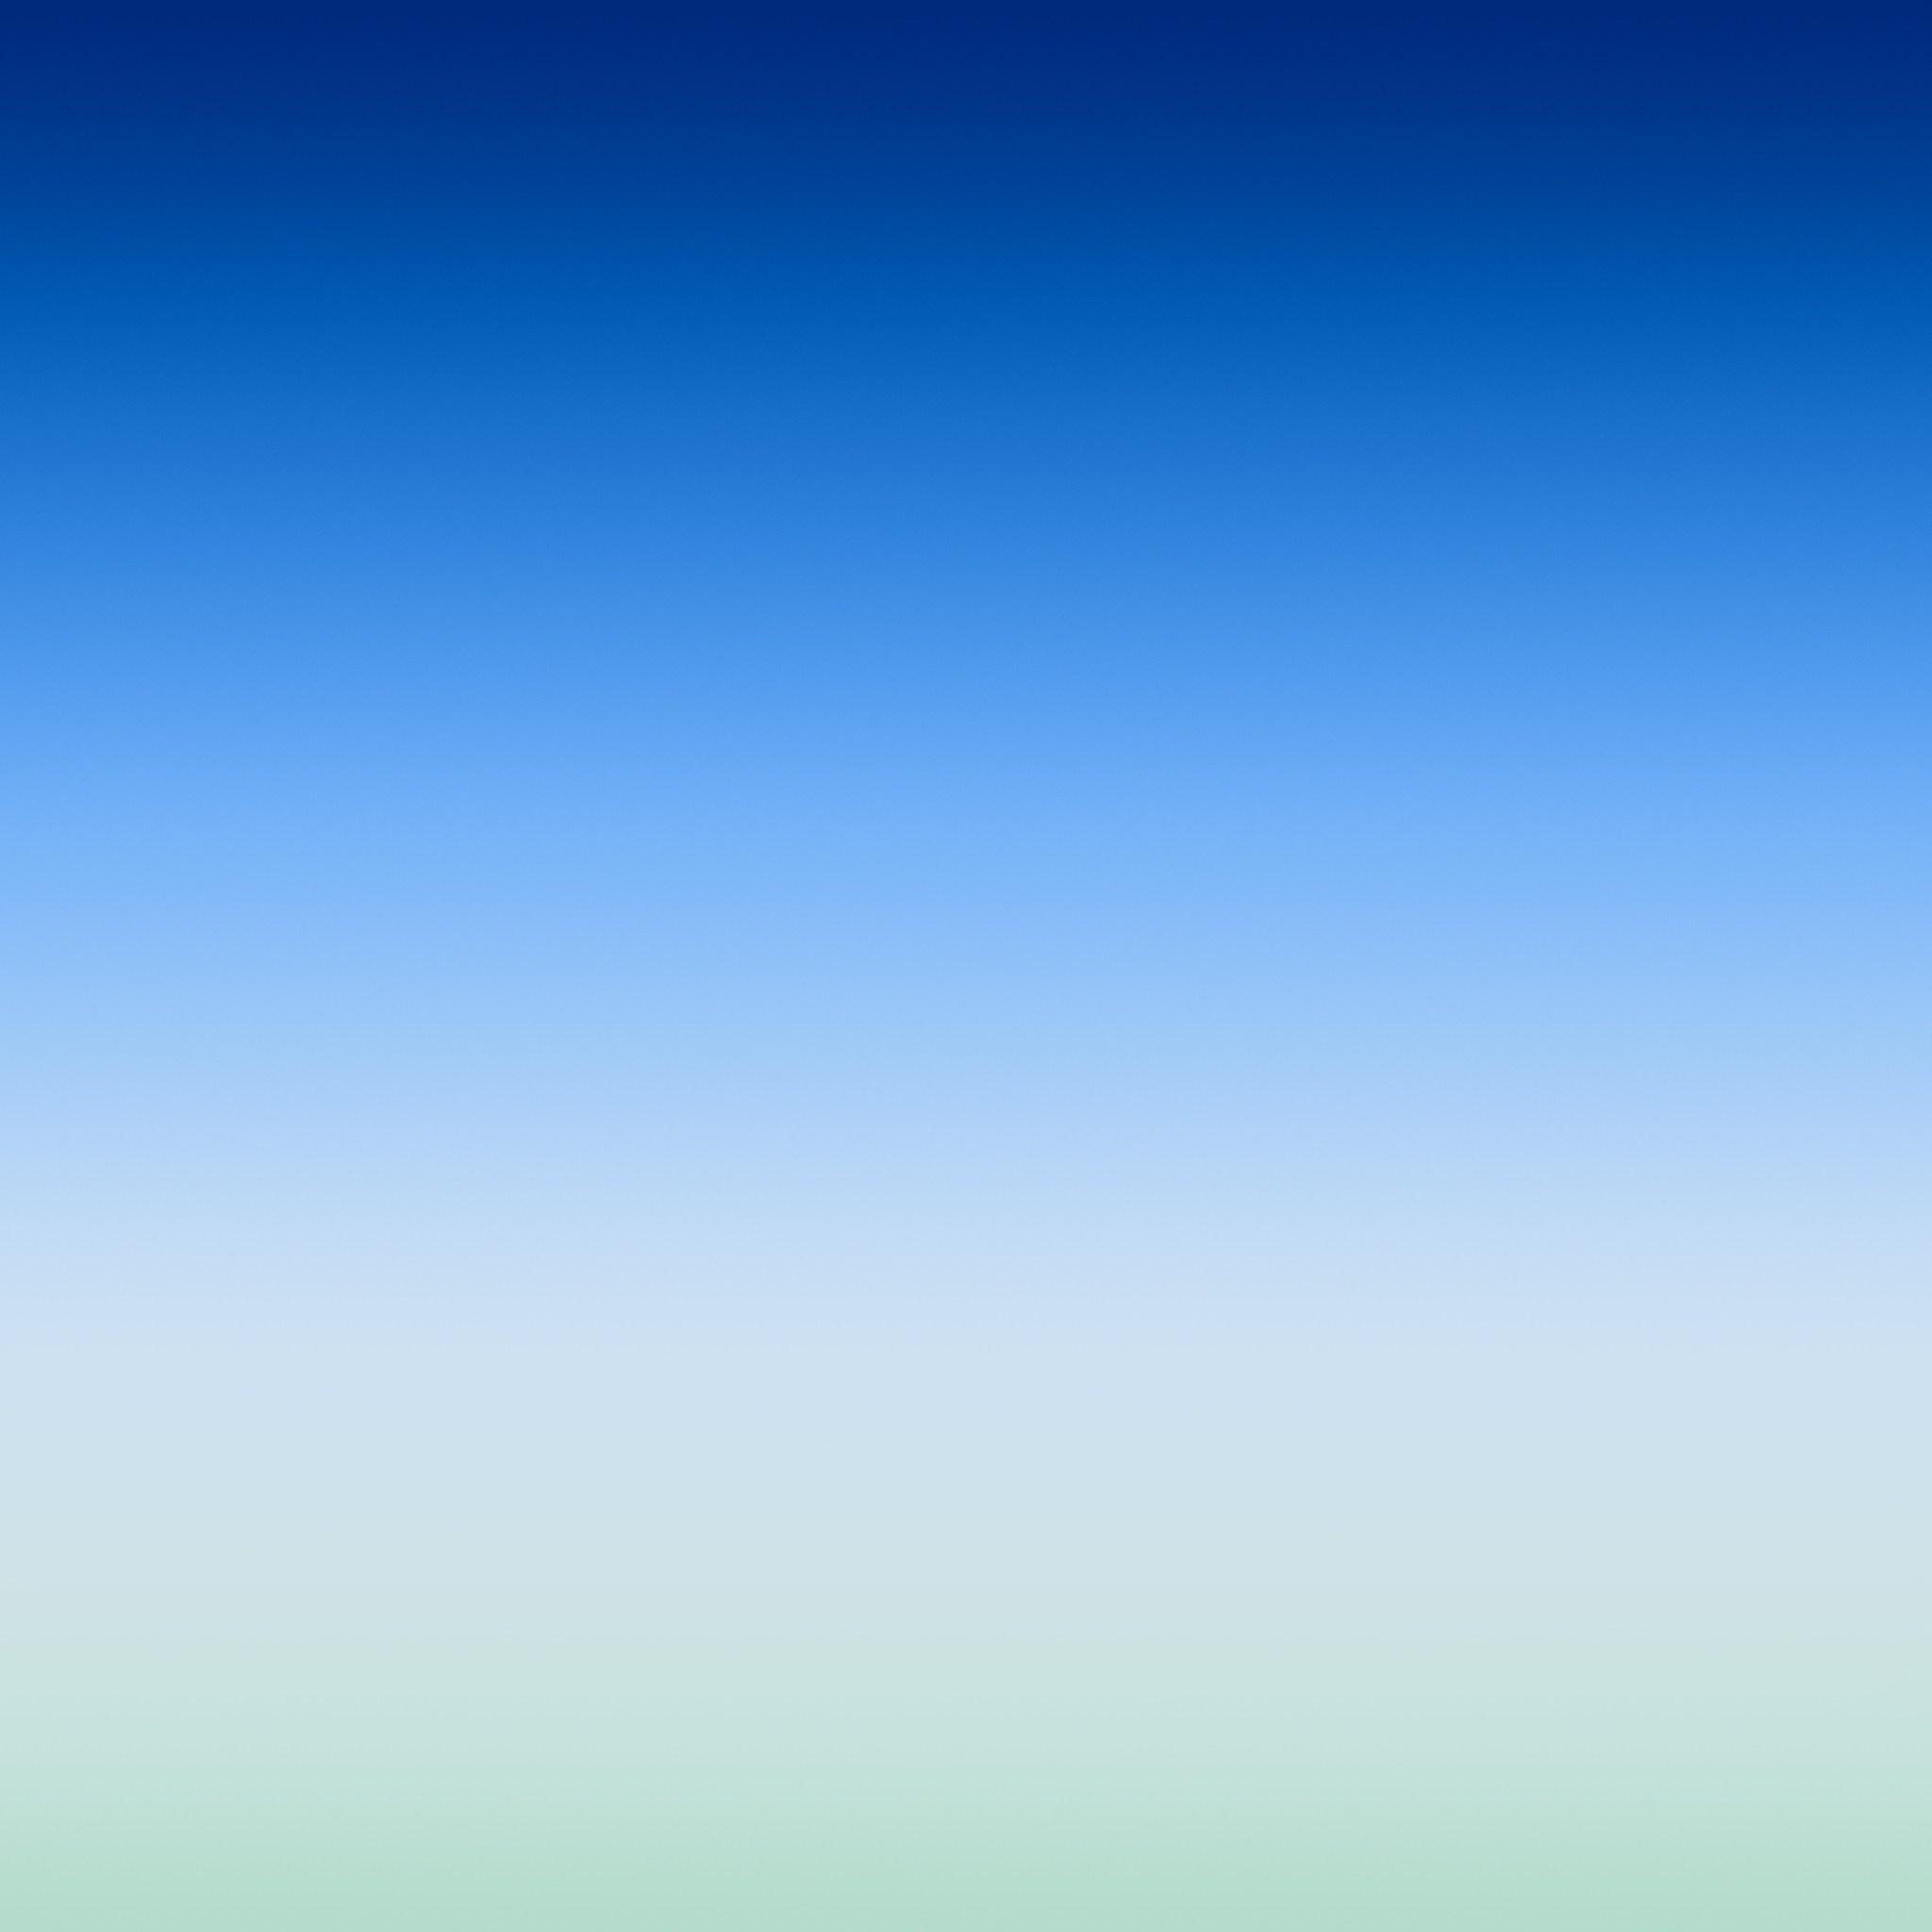 iPad Air Original Wallpaper Beautiful Retina iPad Wallpapers 2048x2048